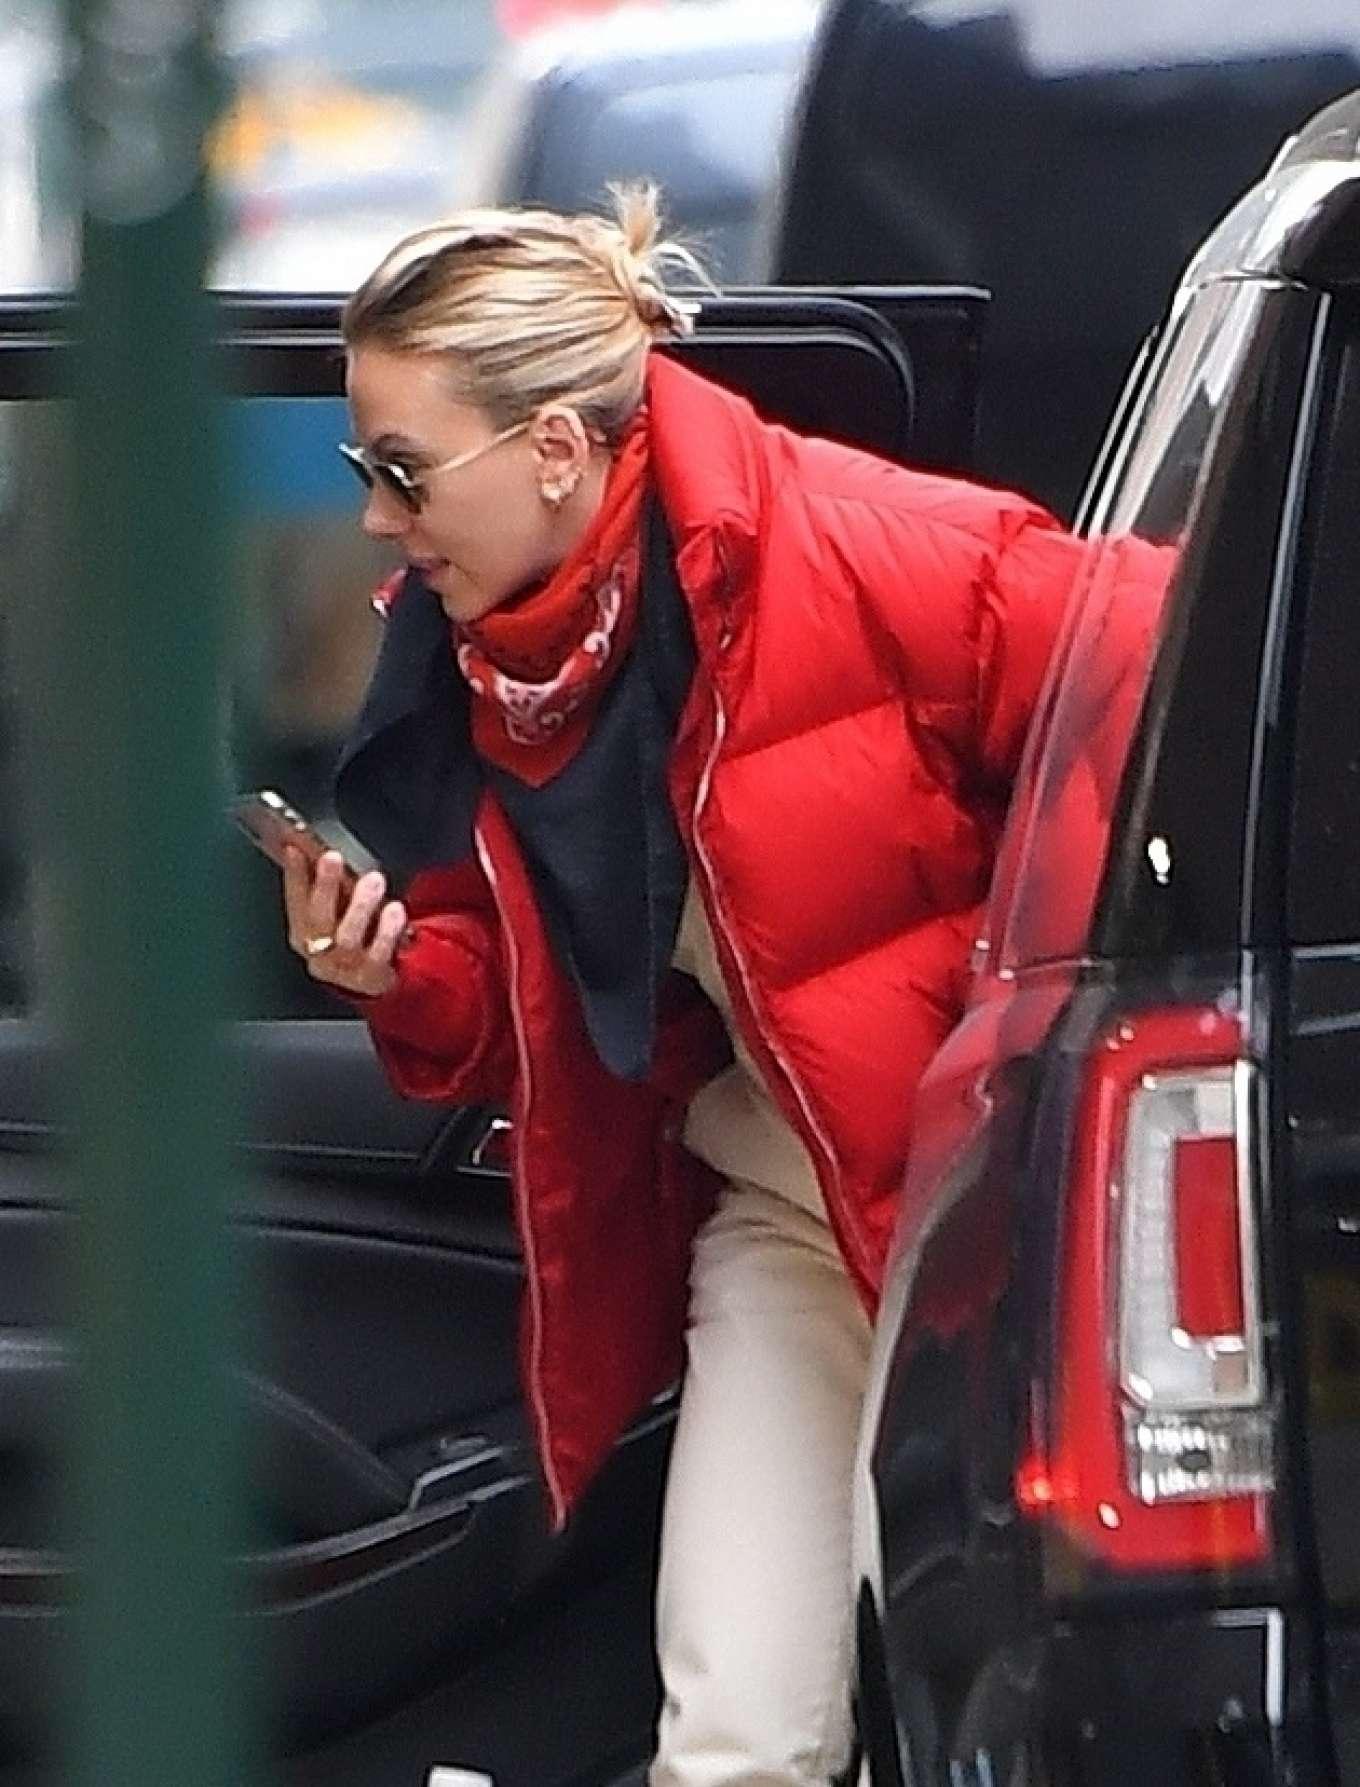 Scarlett Johansson - Arrives for Saturday Night Live Rehearsals at NBC Studios in New York